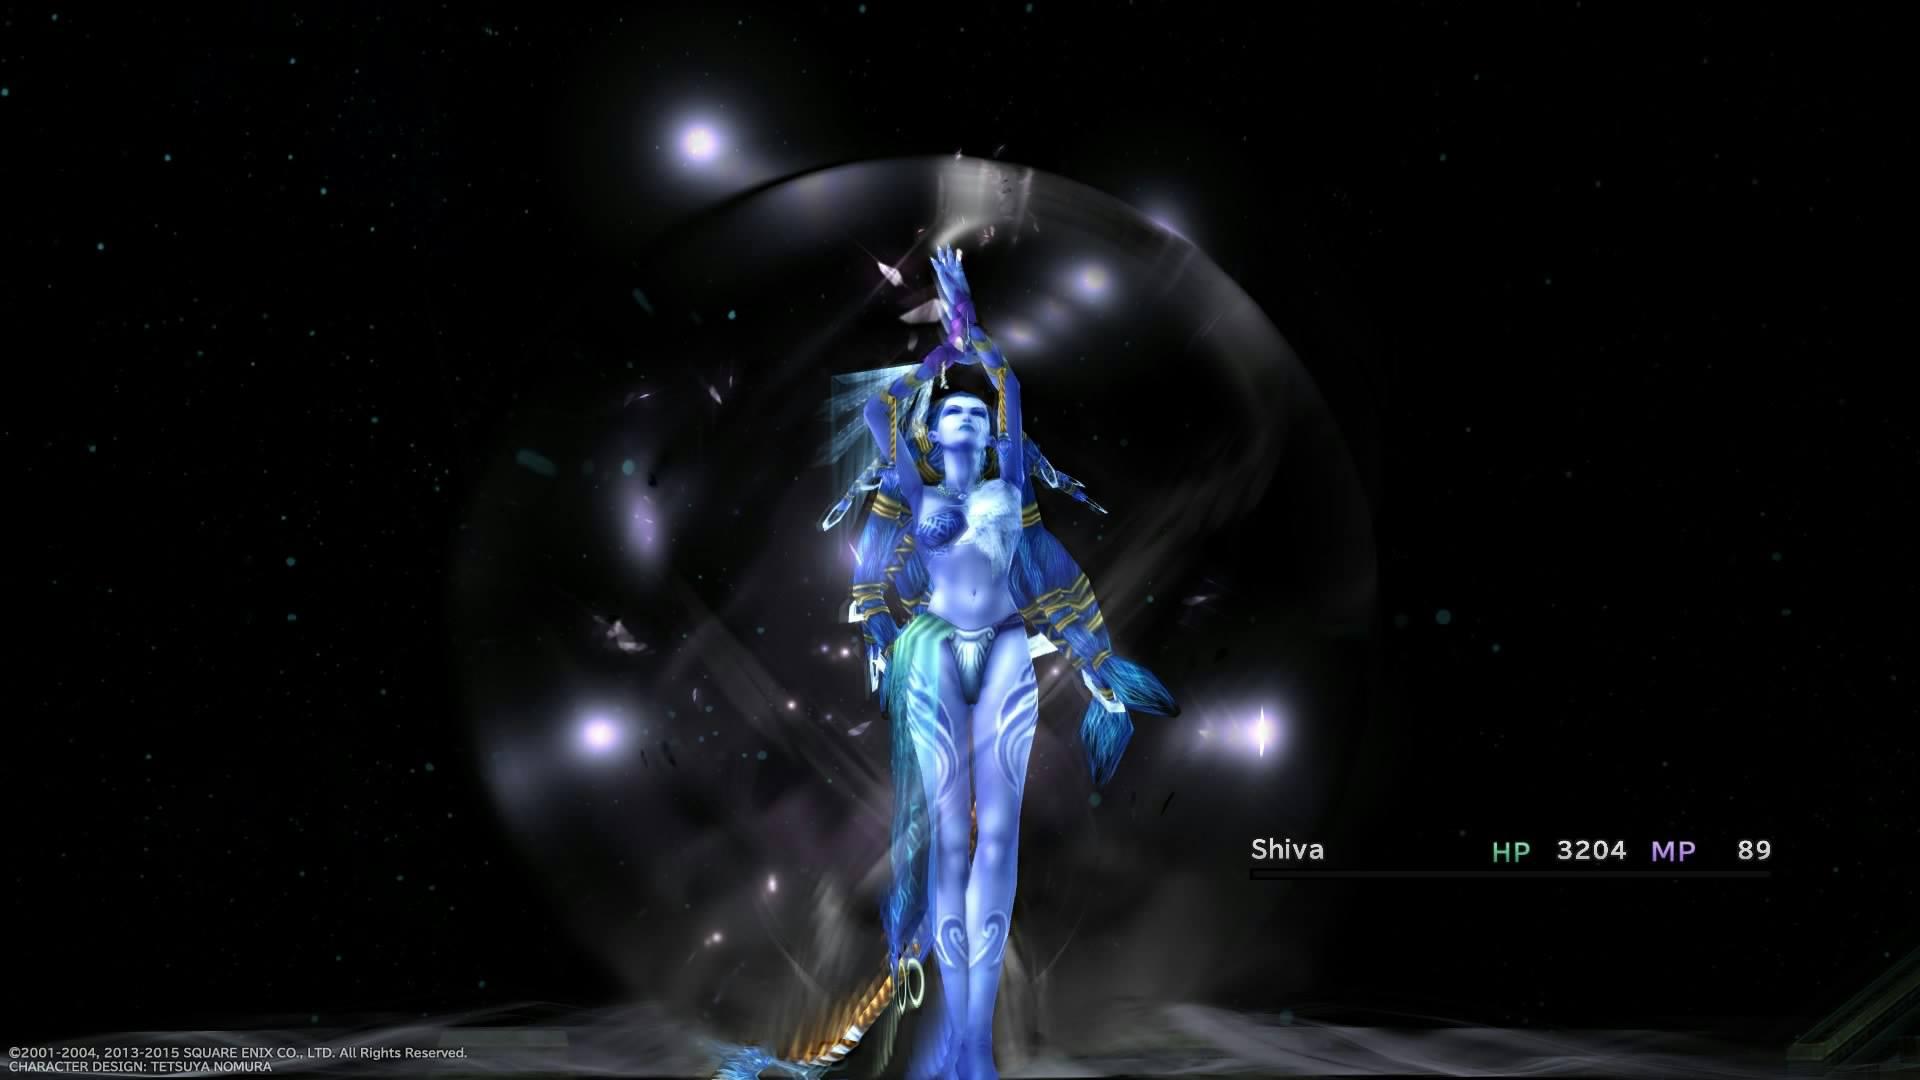 Final Fantasy Summons - Skyrim Mod Requests - The Nexus Forums